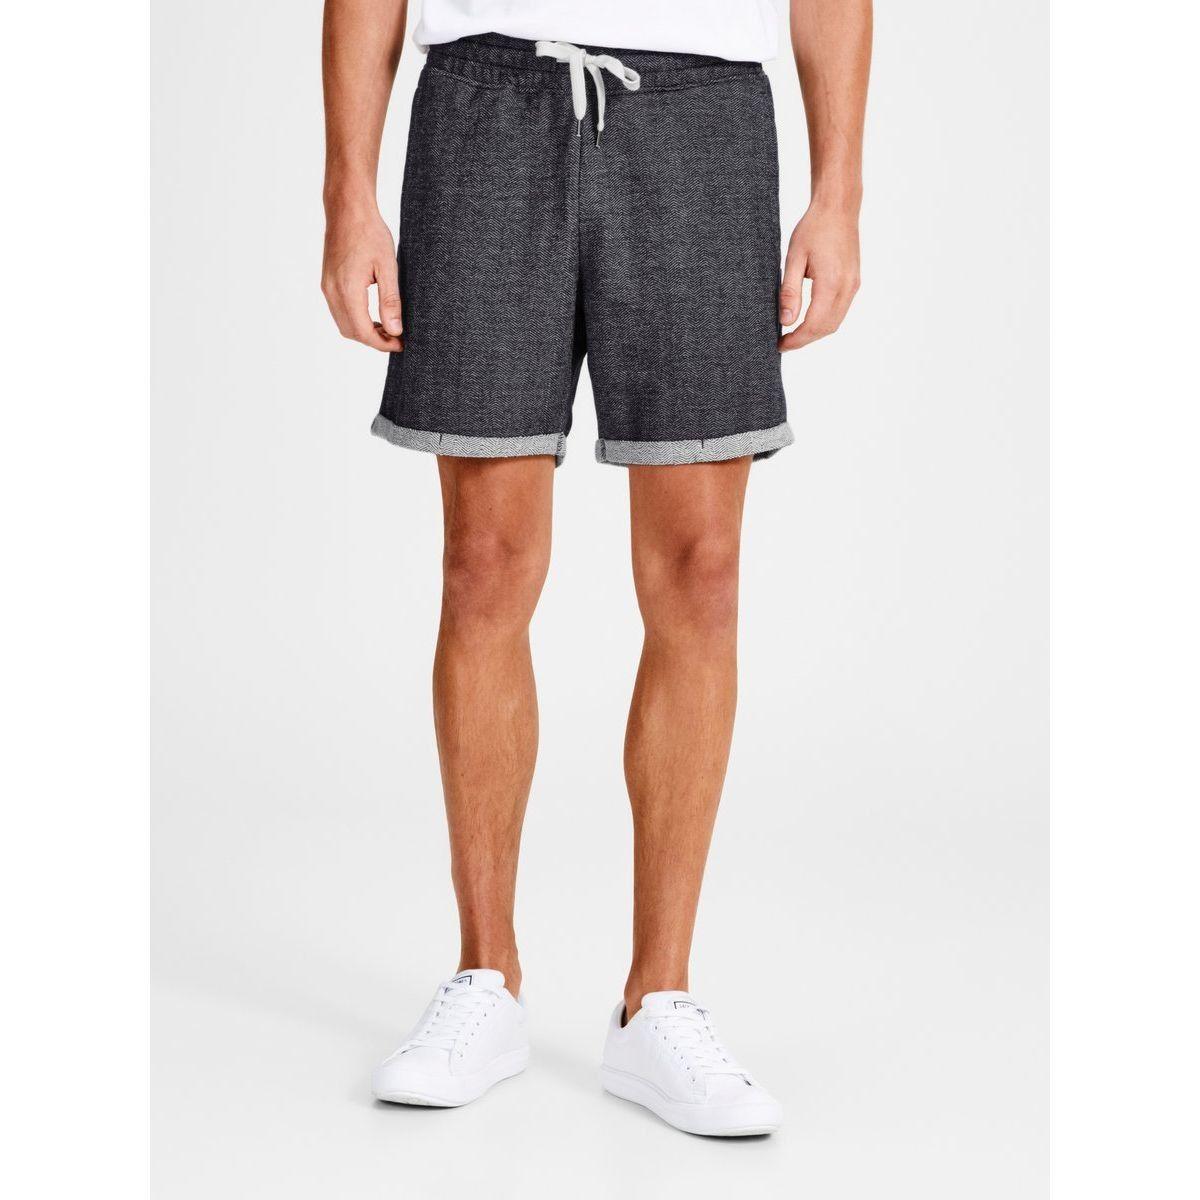 8b985552616950 Shorts En Molleton Confortable - Taille : M;XL | Products | Short ...